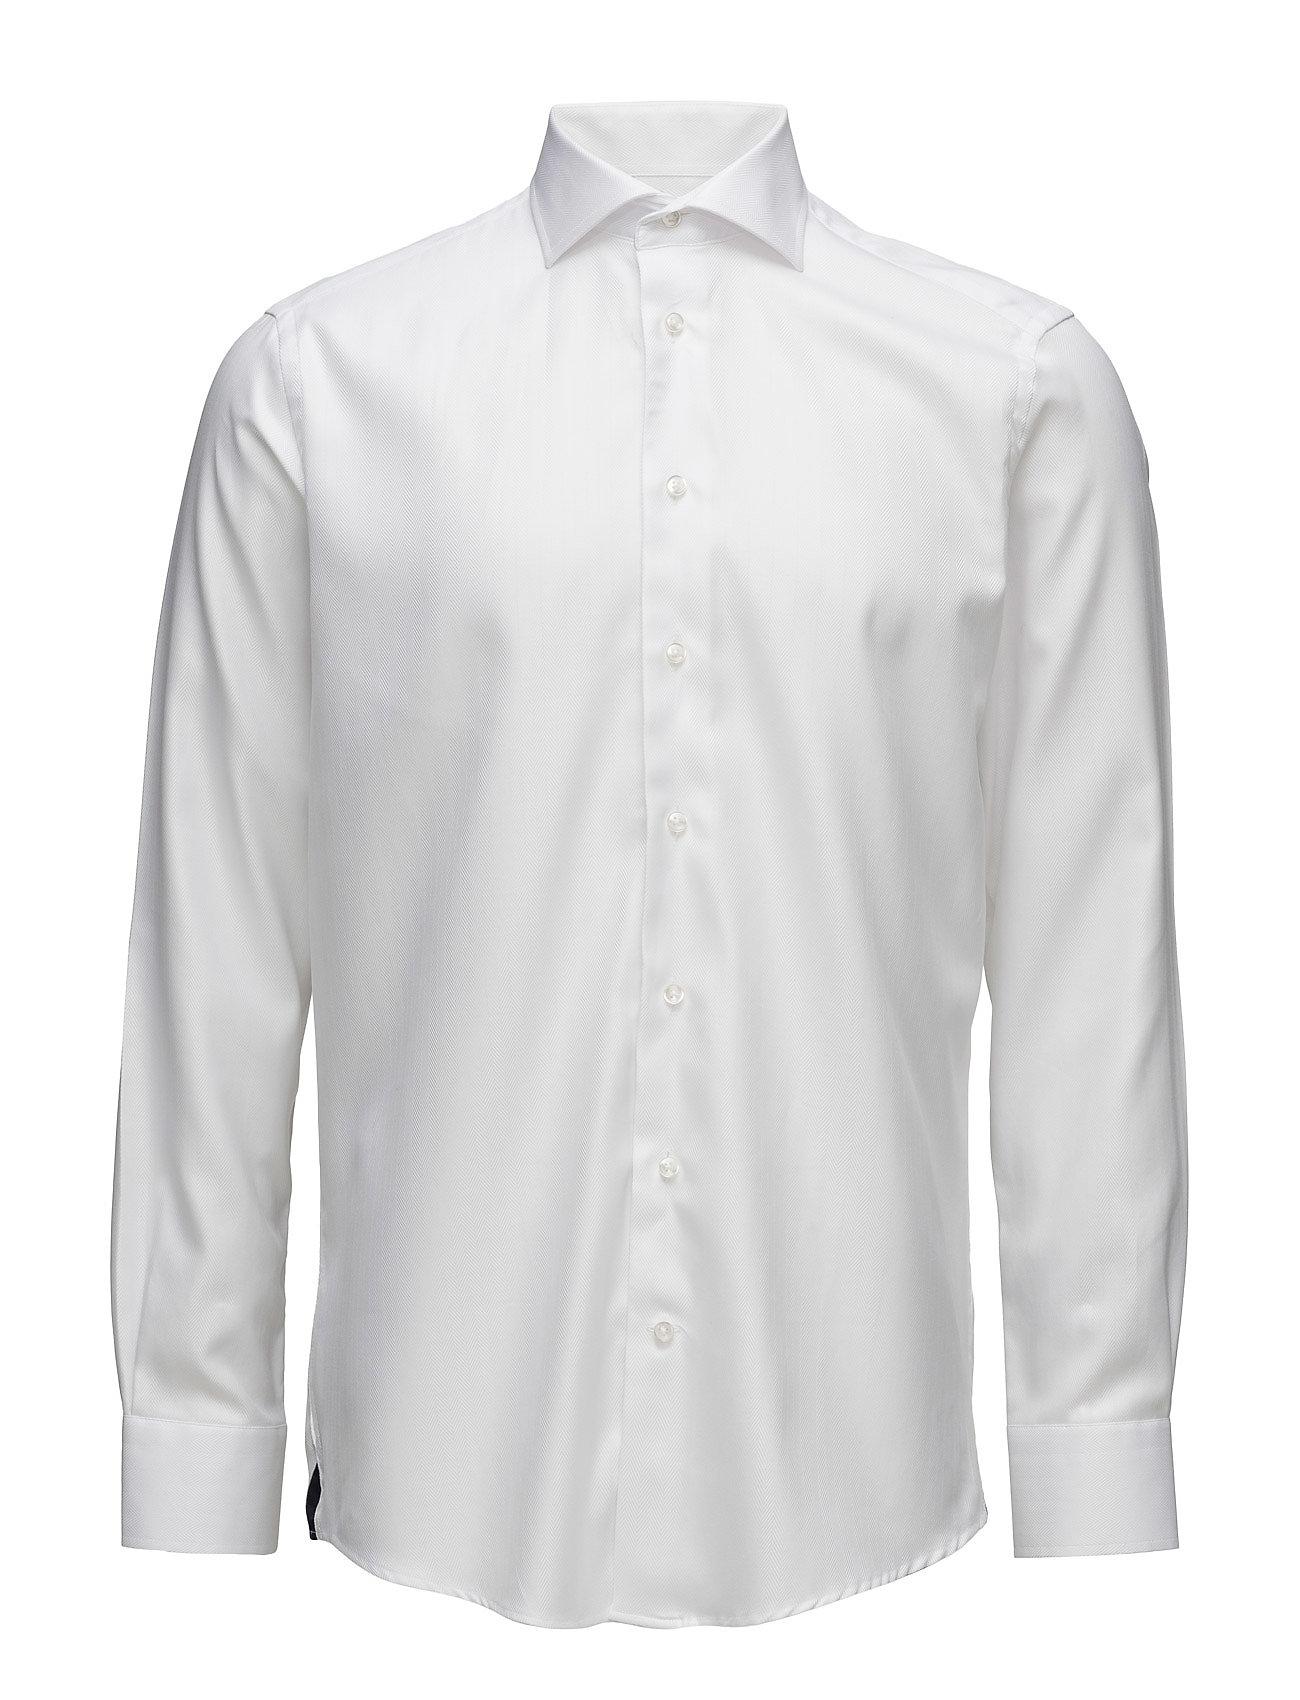 xo shirtmaker – 8541  - gordon fc fra boozt.com dk